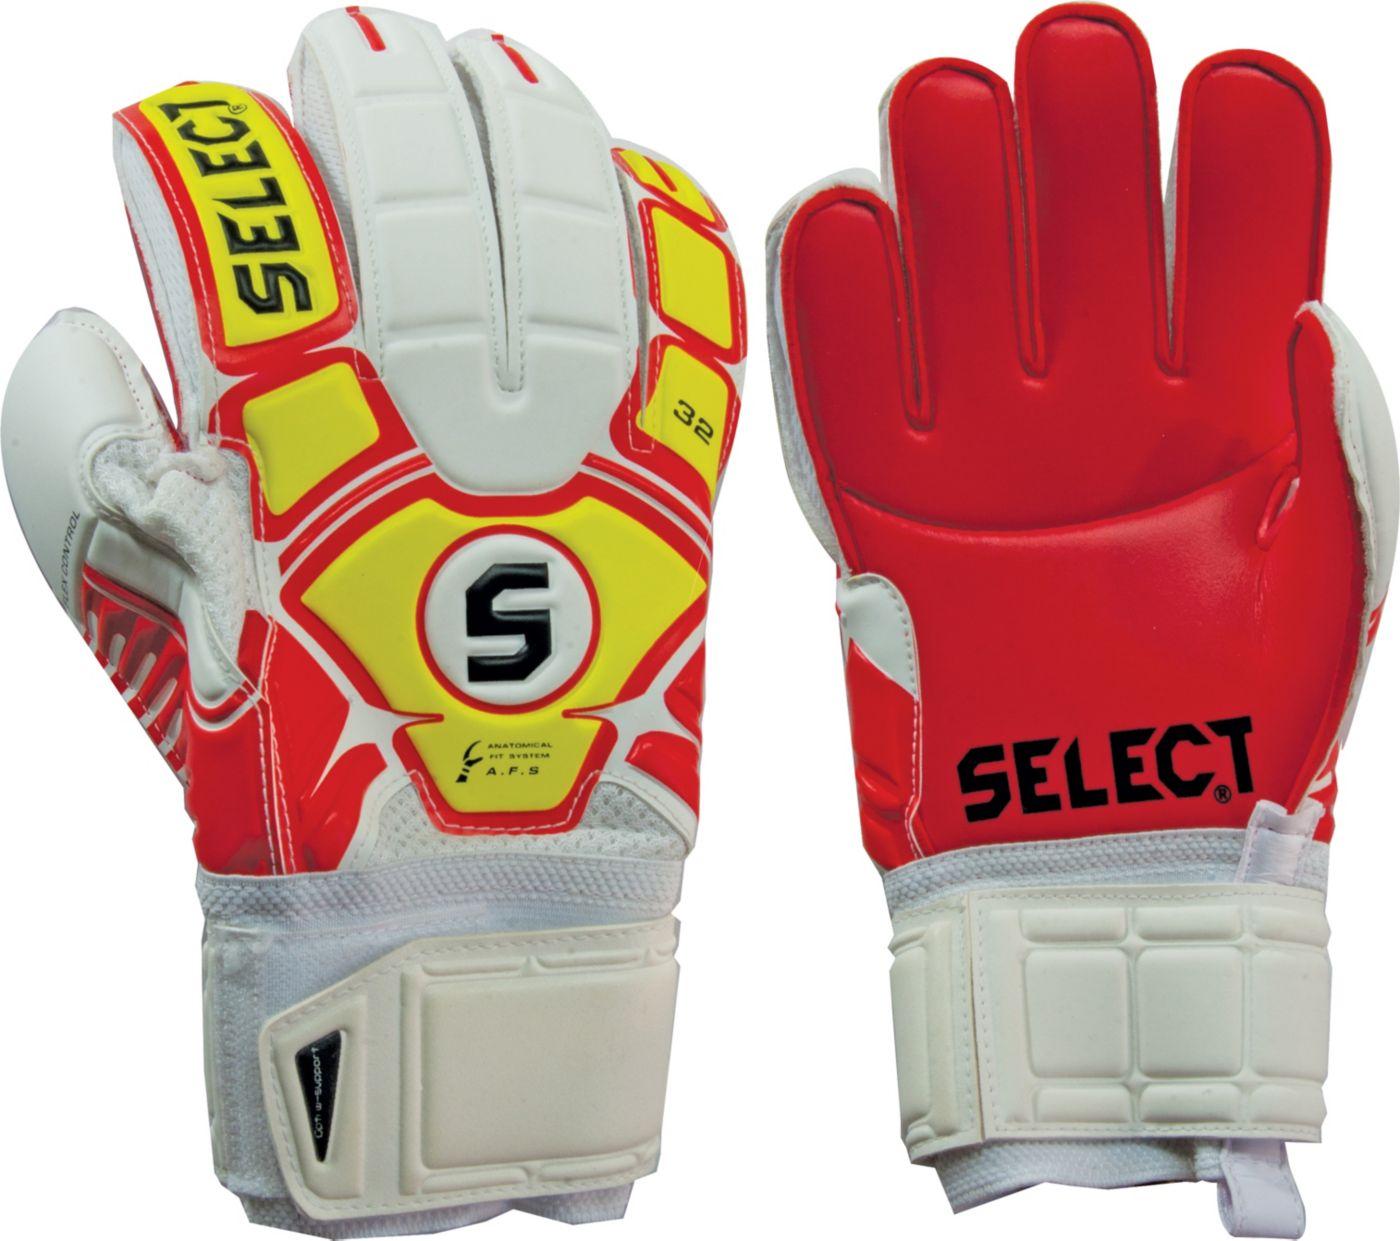 Select Adult 32 Soccer Goalkeeper Gloves